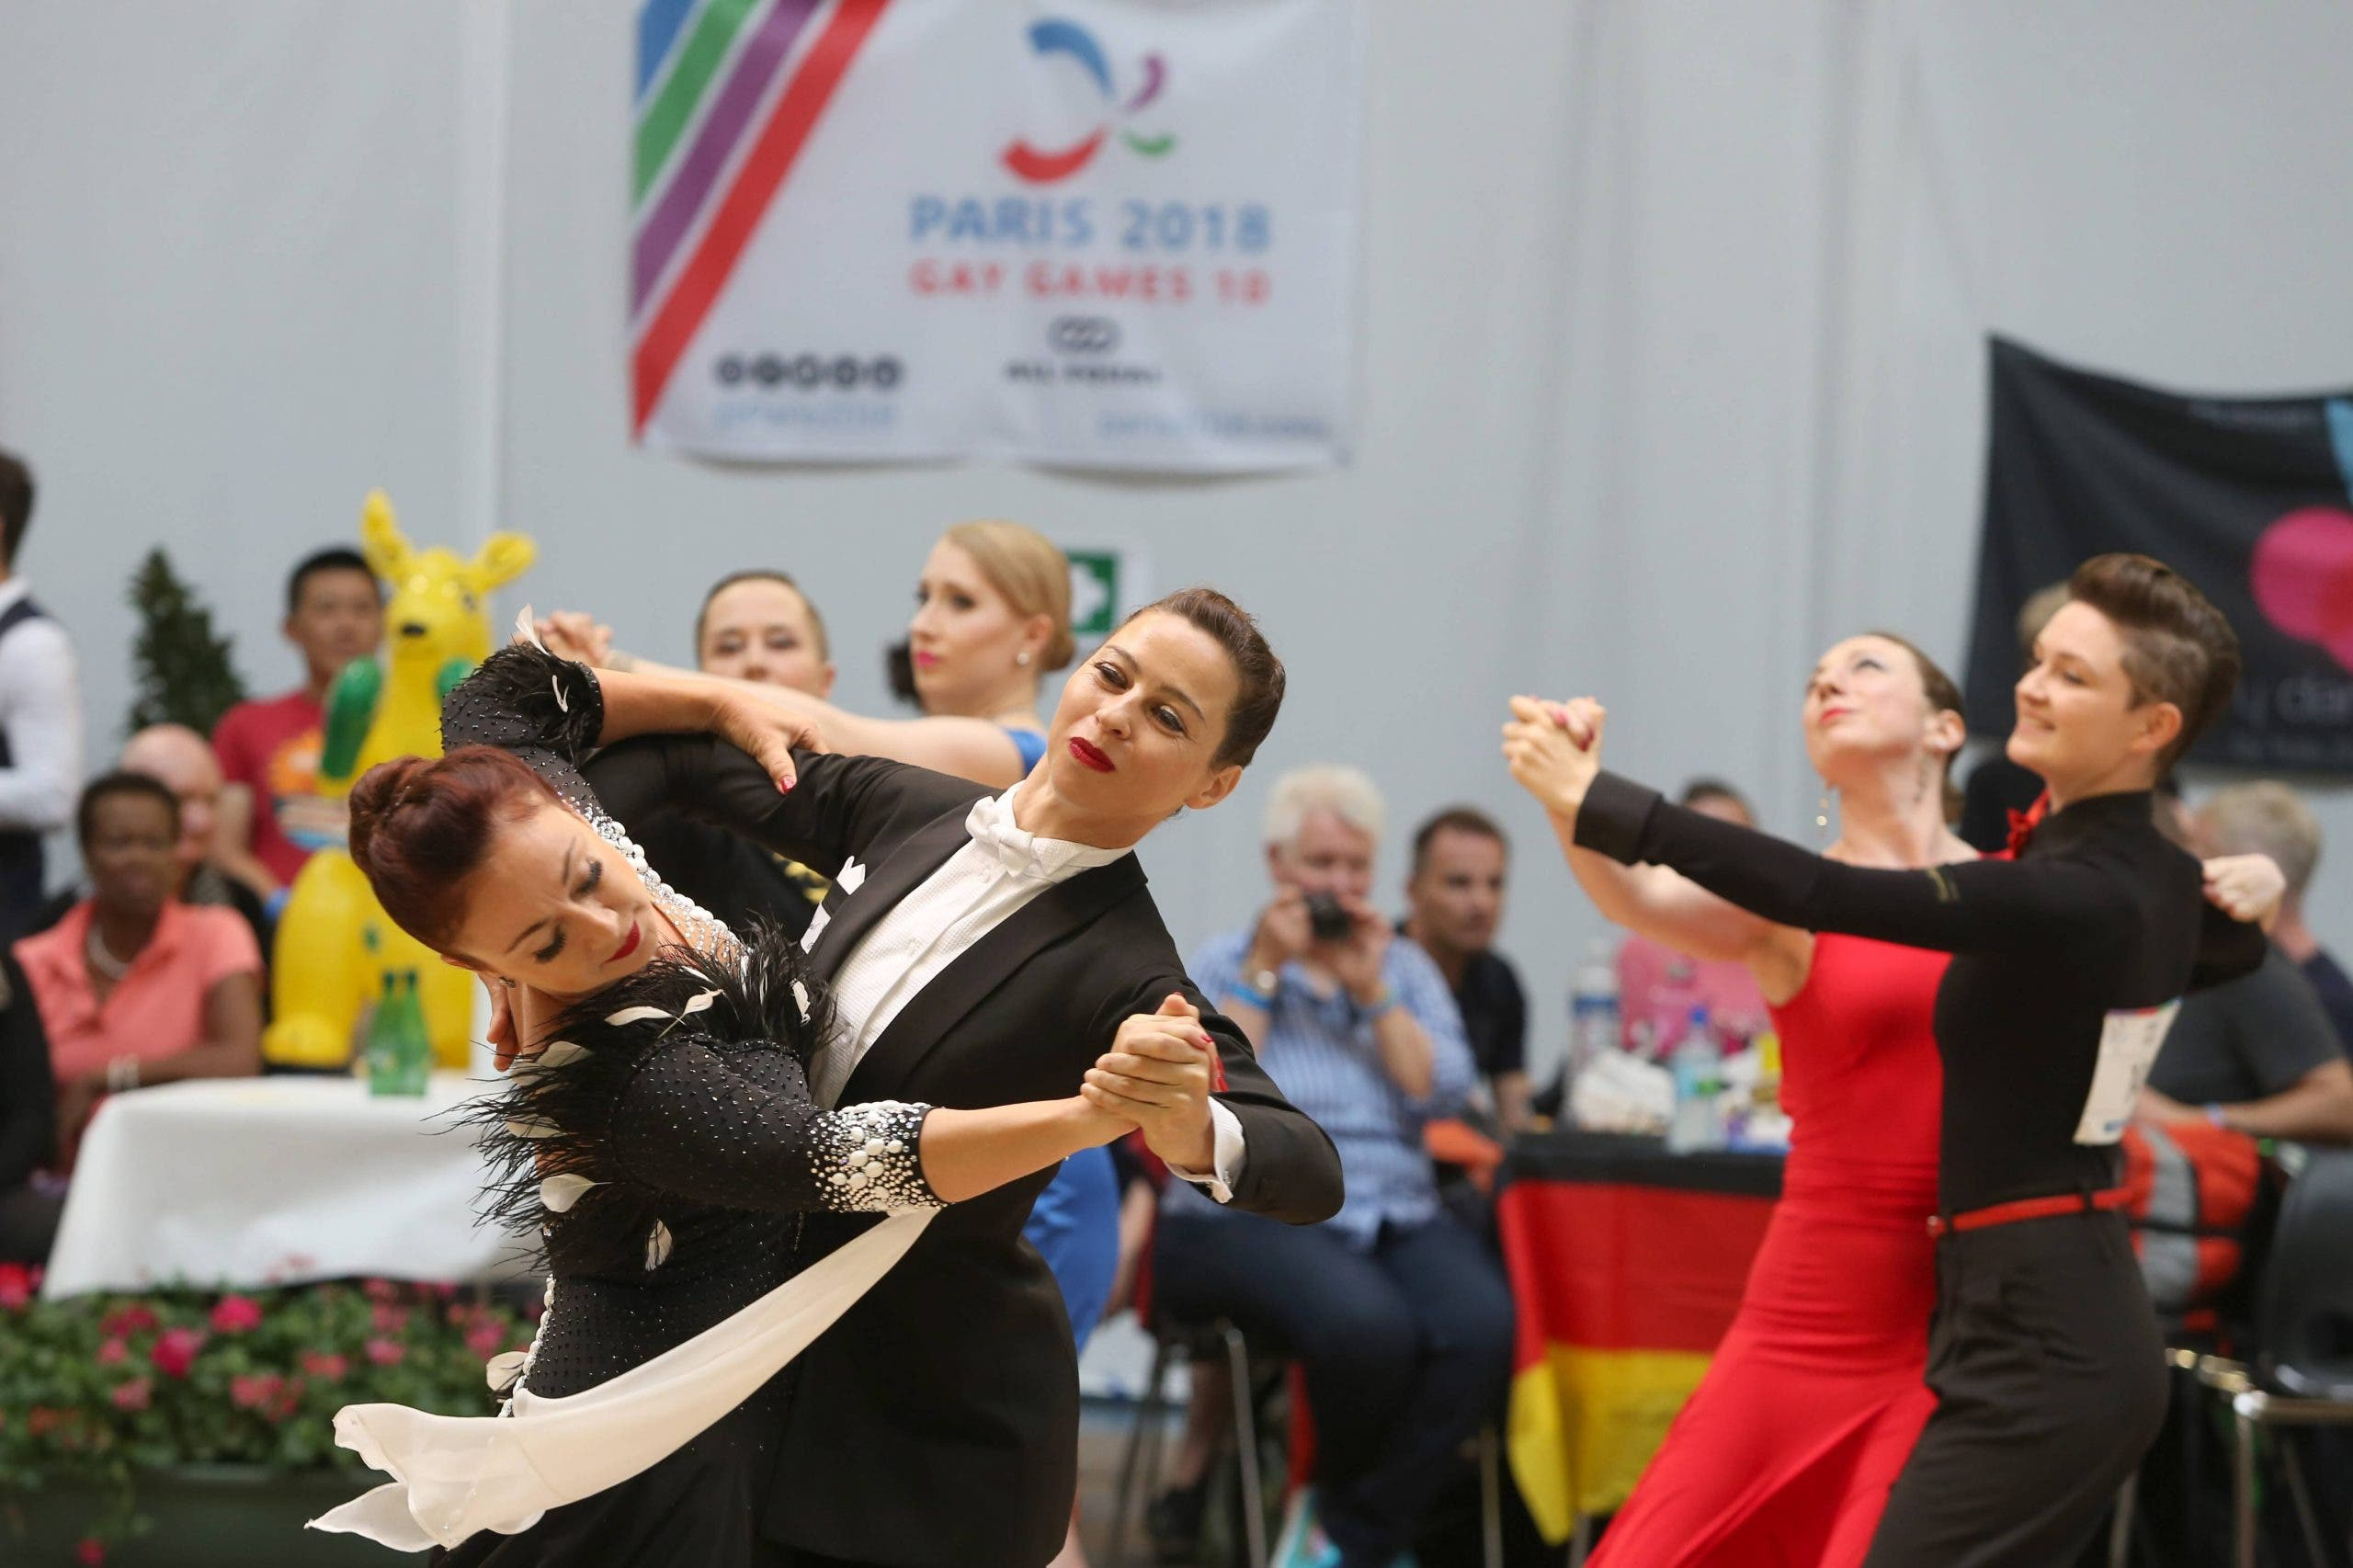 Epreuves De Danse Sportive Gay Games 2018 Paris 09 08 2018 Michaelbaucher Panoramic Publicati